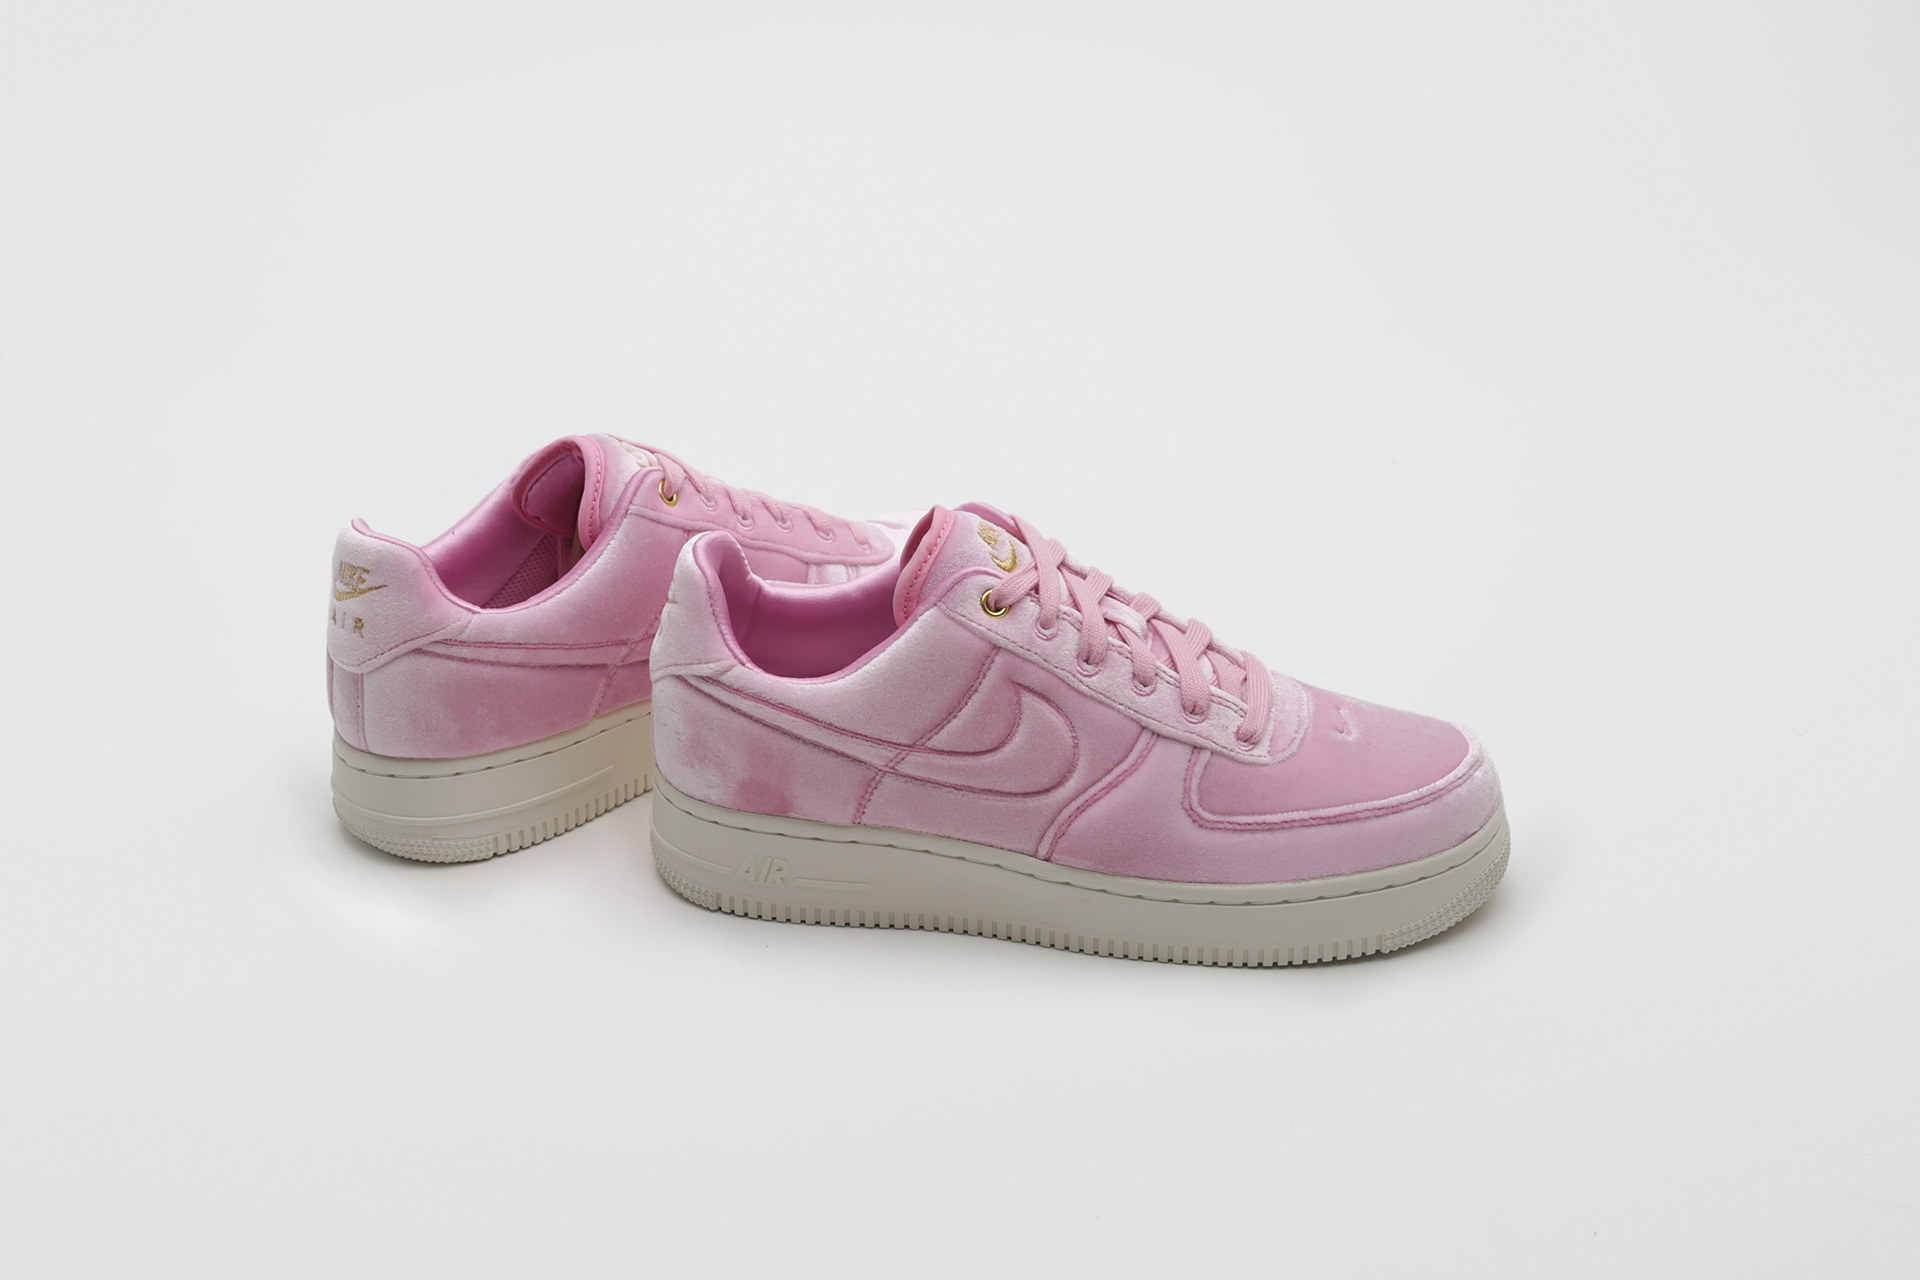 068b1bce Купить розовые кроссовки Air Force 1 '07 PRM 3 от Nike (AT4144-600 ...